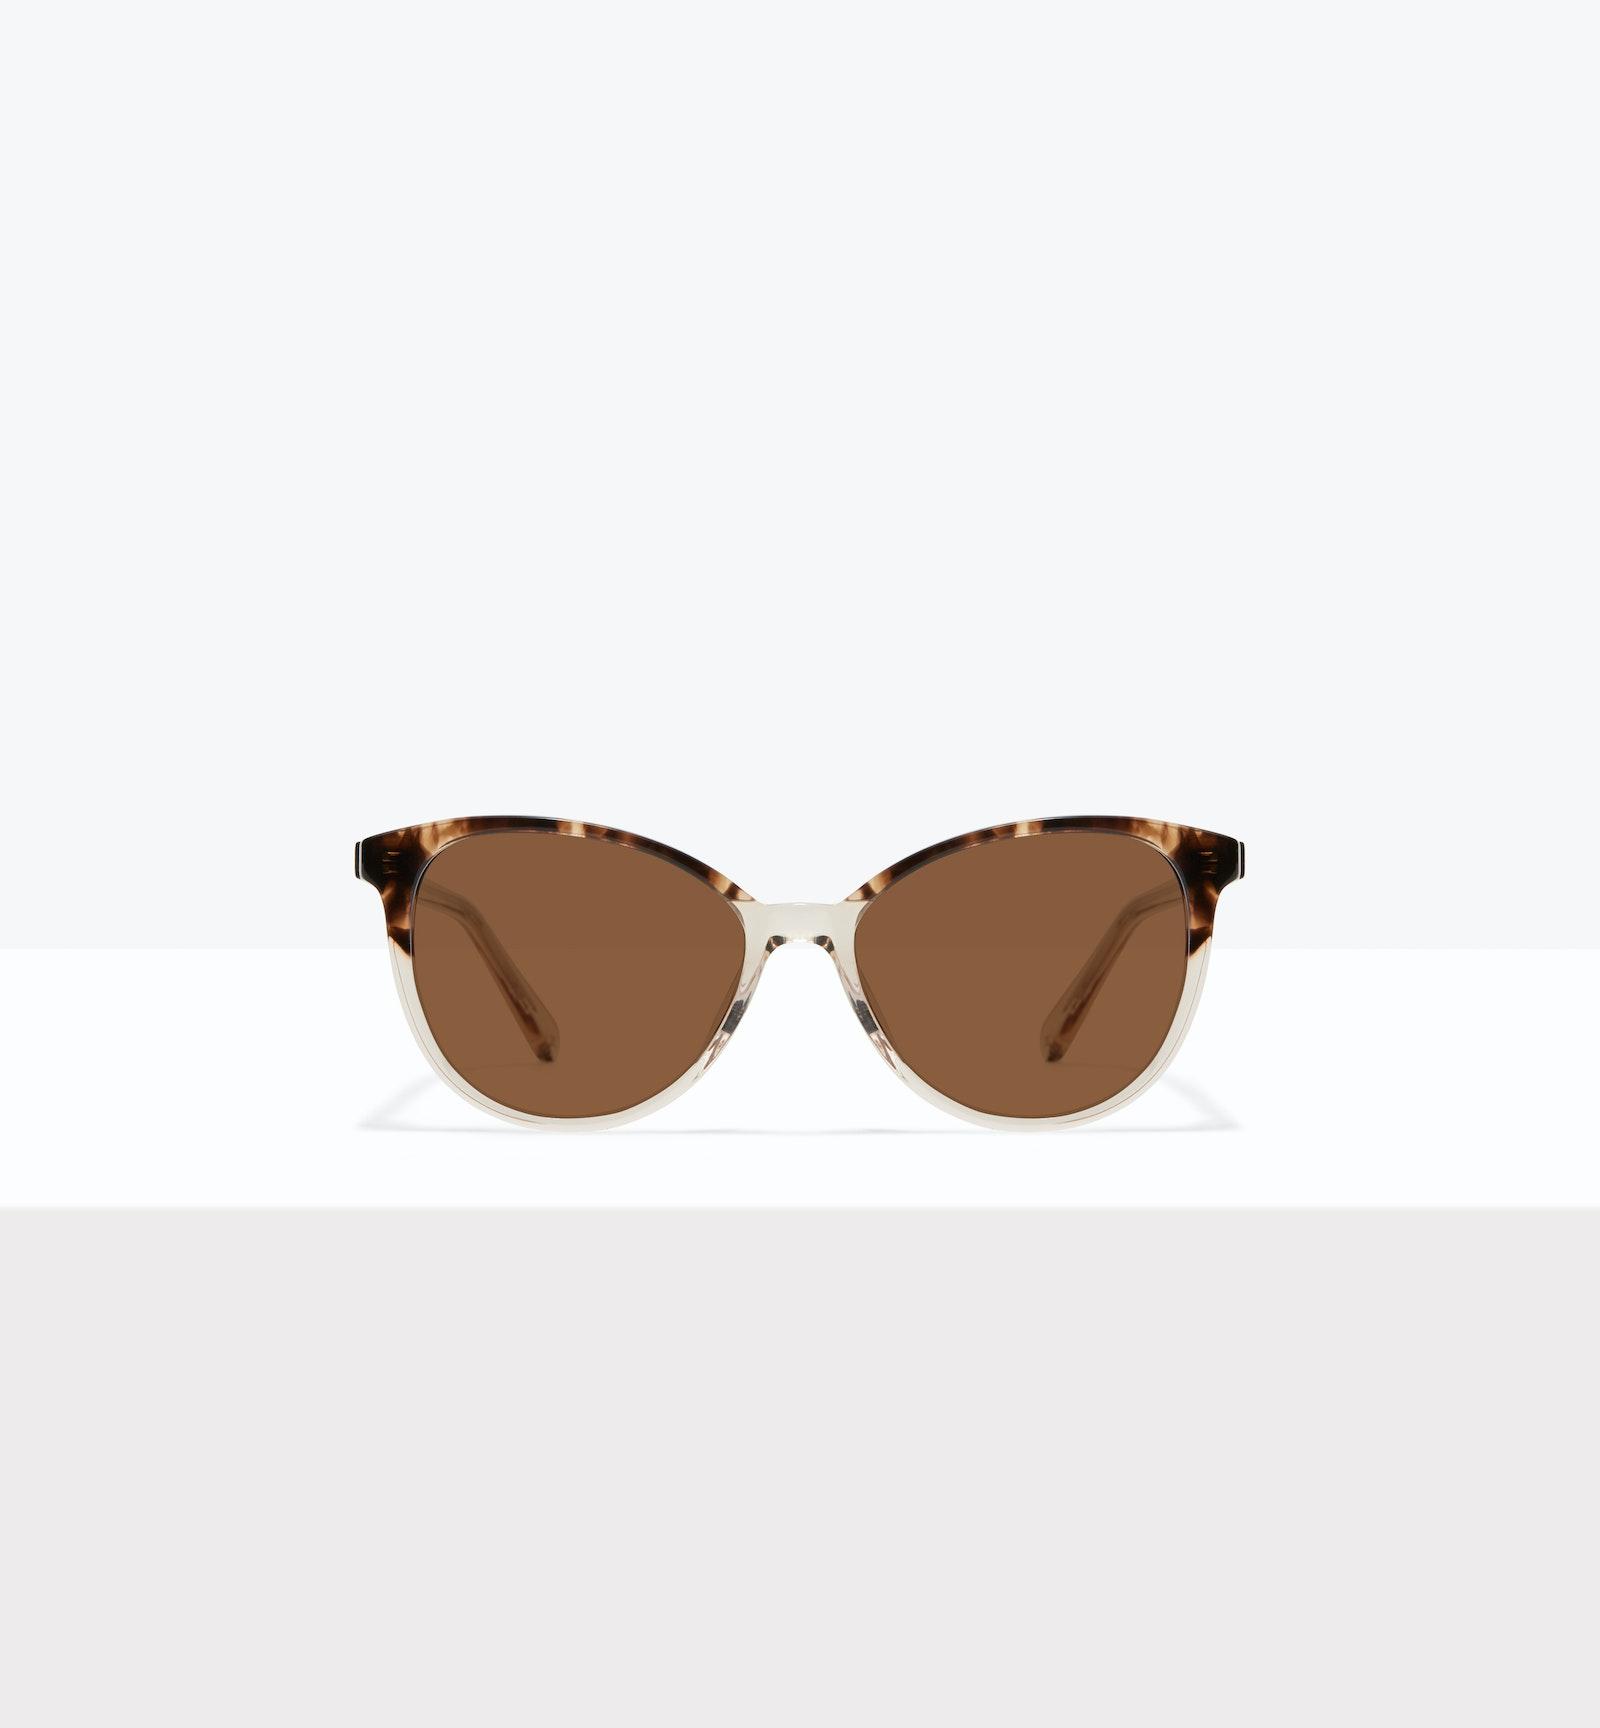 Affordable Fashion Glasses Cat Eye Sunglasses Women Esprit M Golden Tortoise